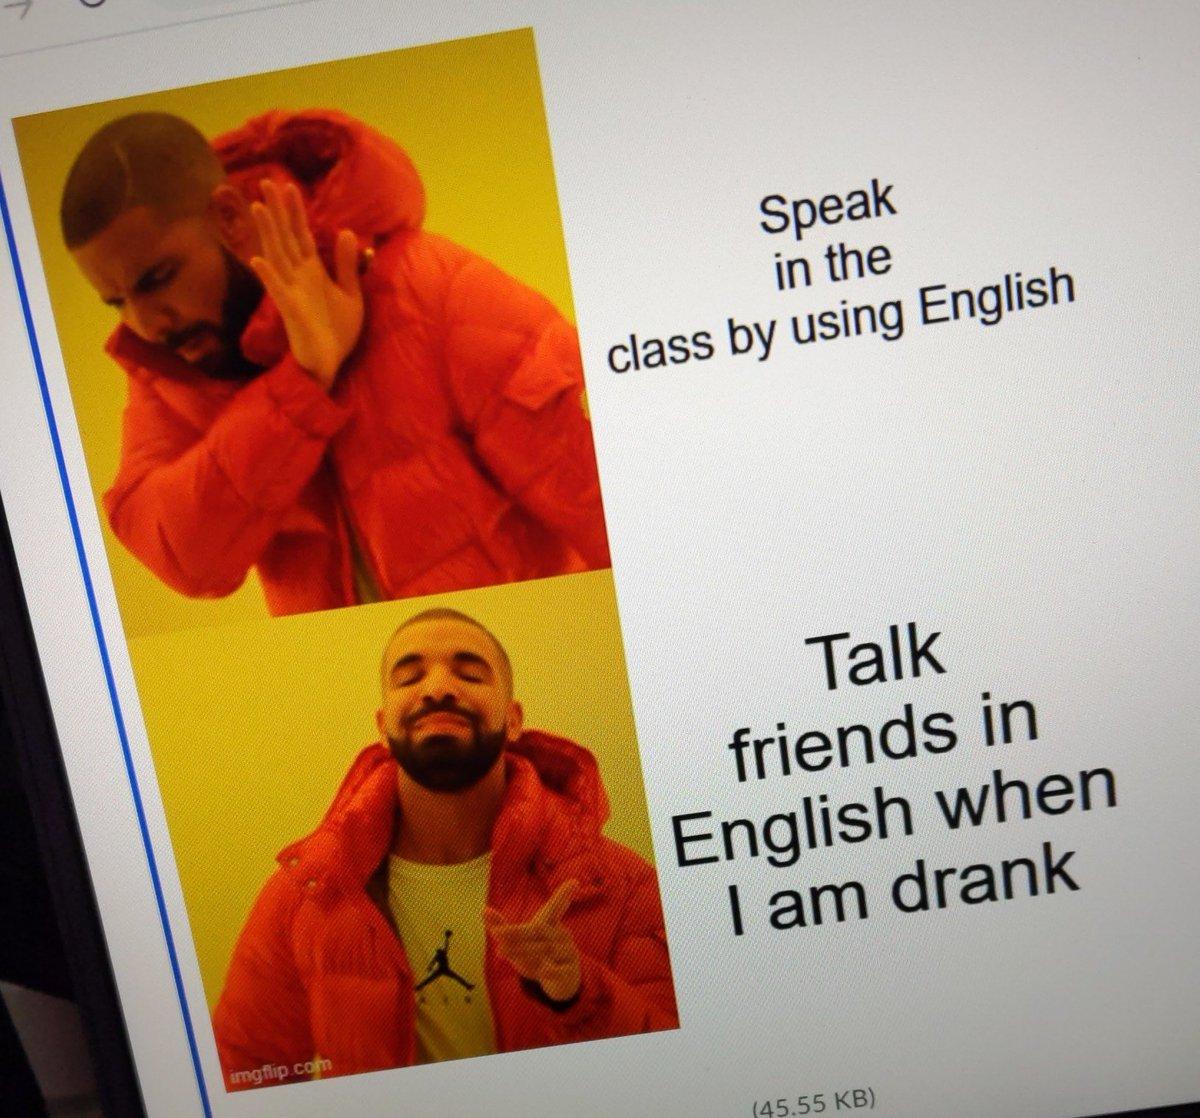 Number 1 #drake #meme #elt #students #remoteteaching #remotelearning